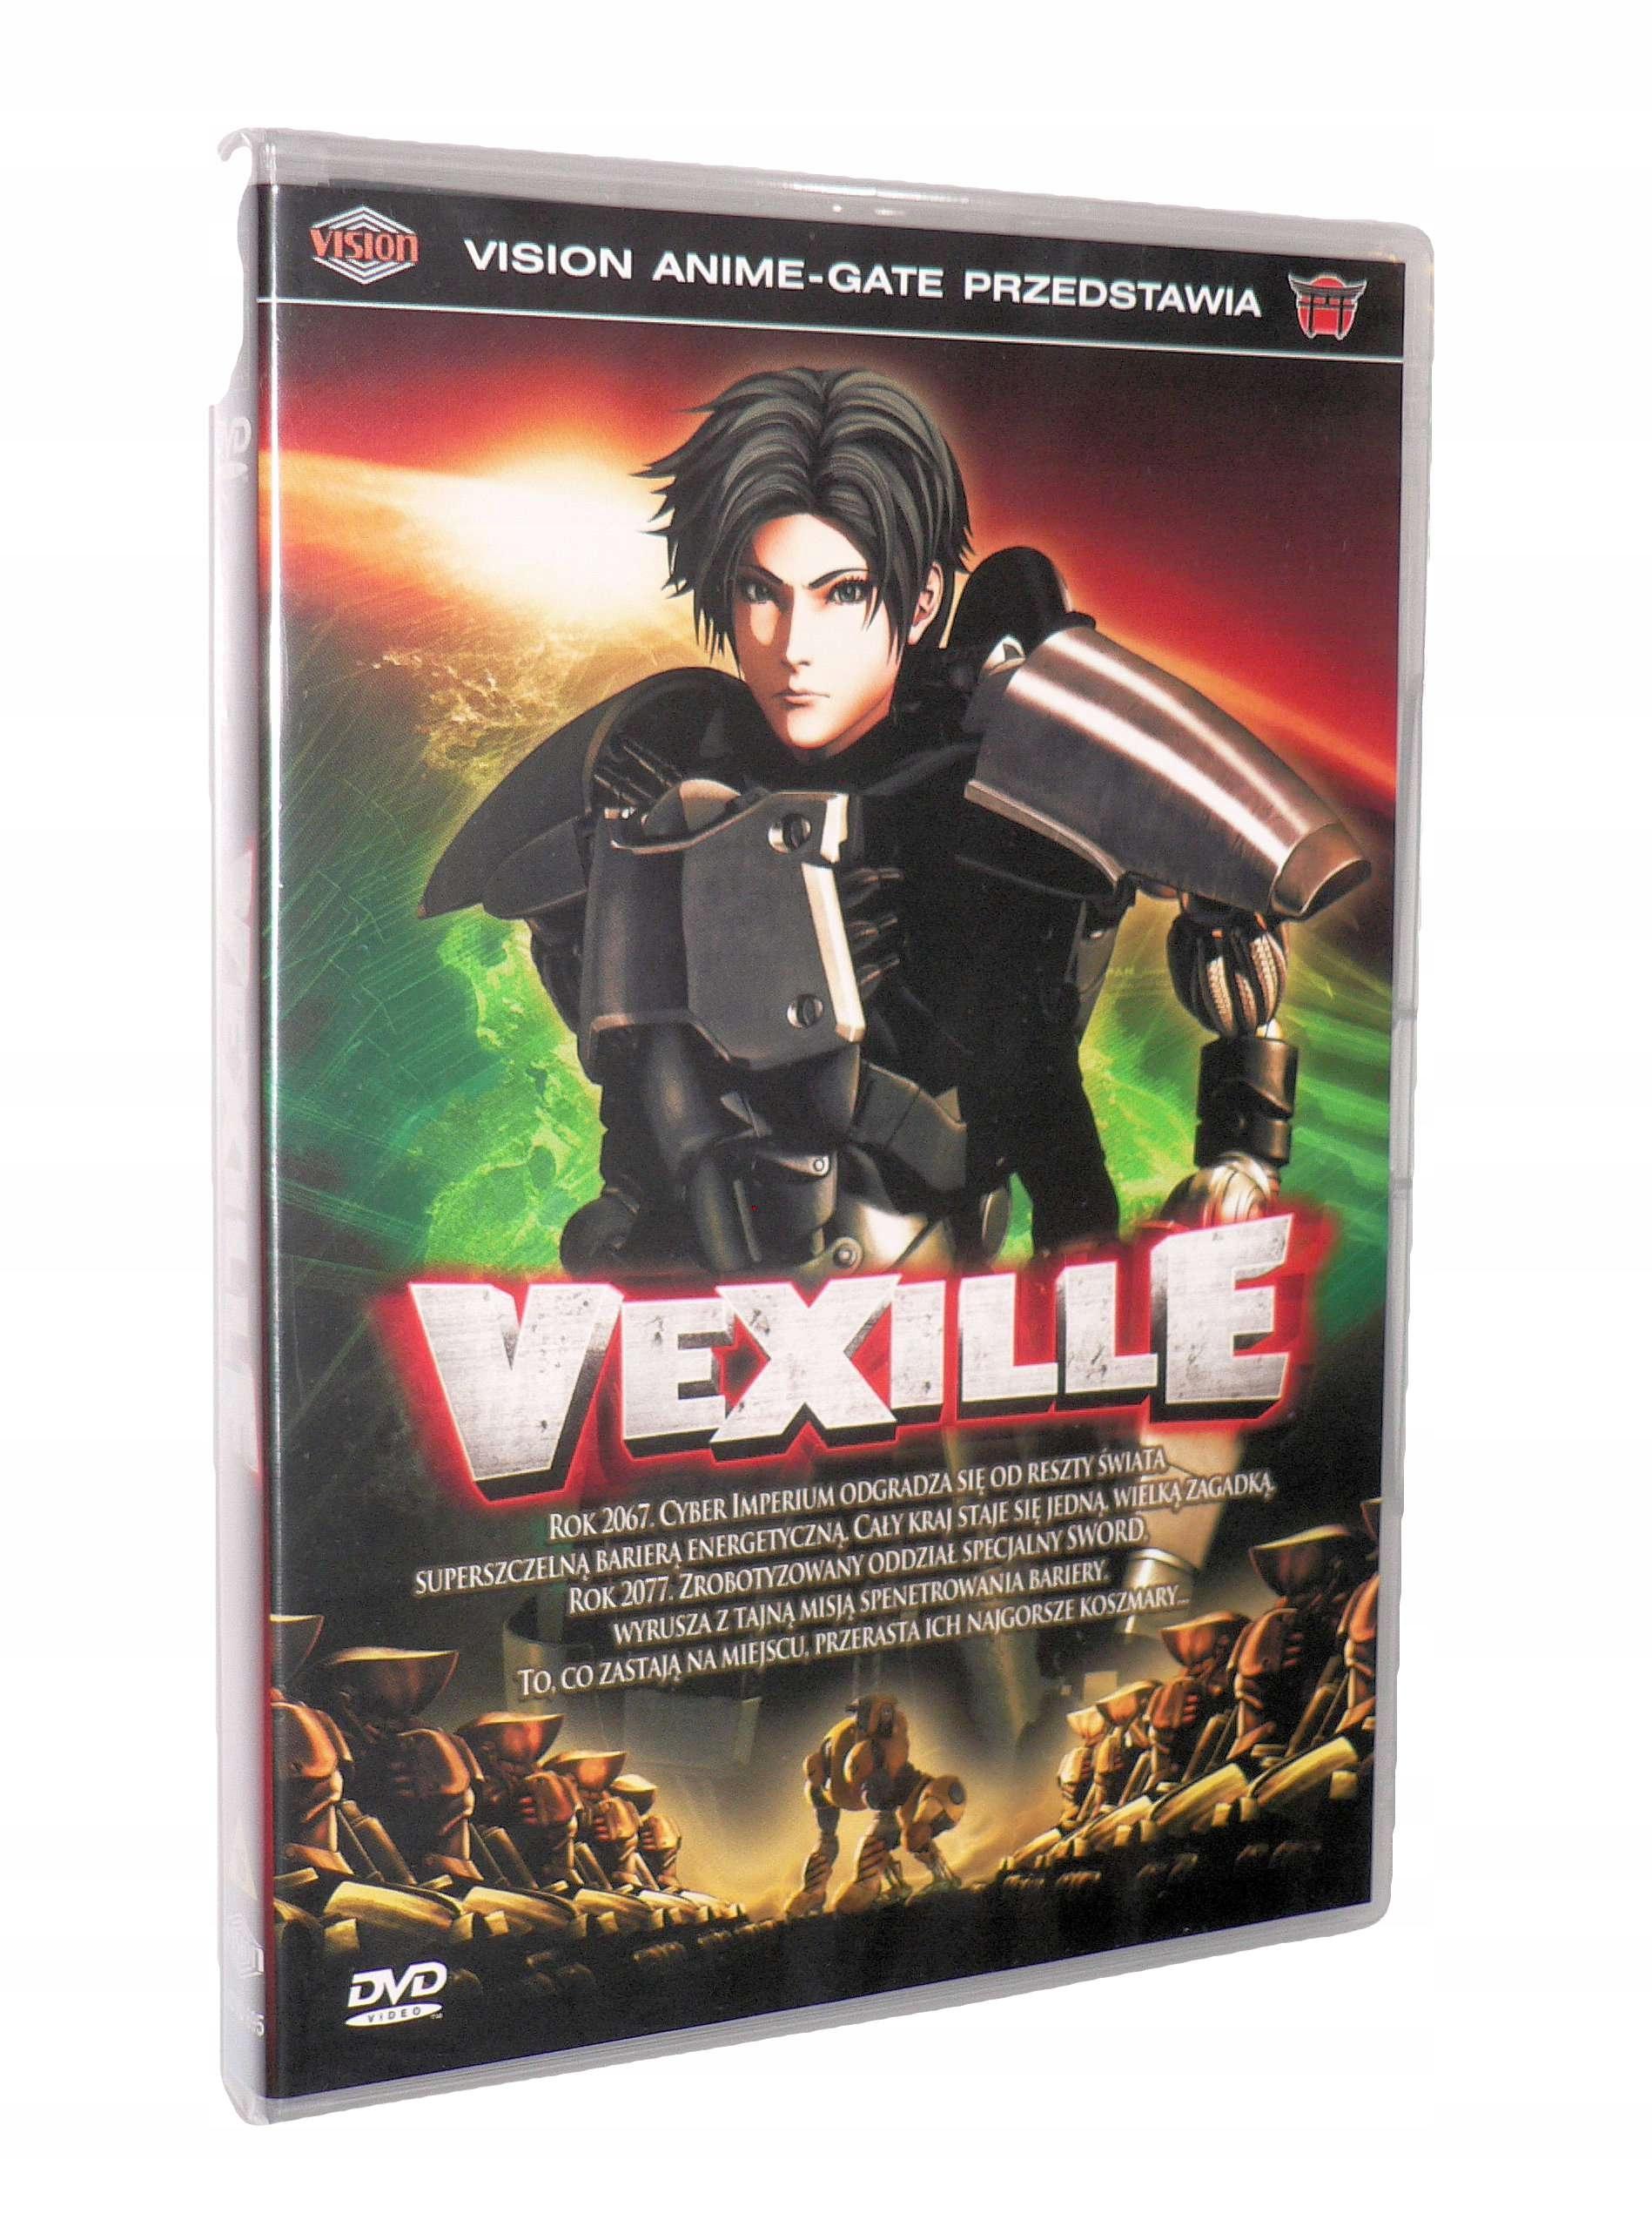 DVD - VEXILLE (2007) - T.Sakurai nowa folia lektor